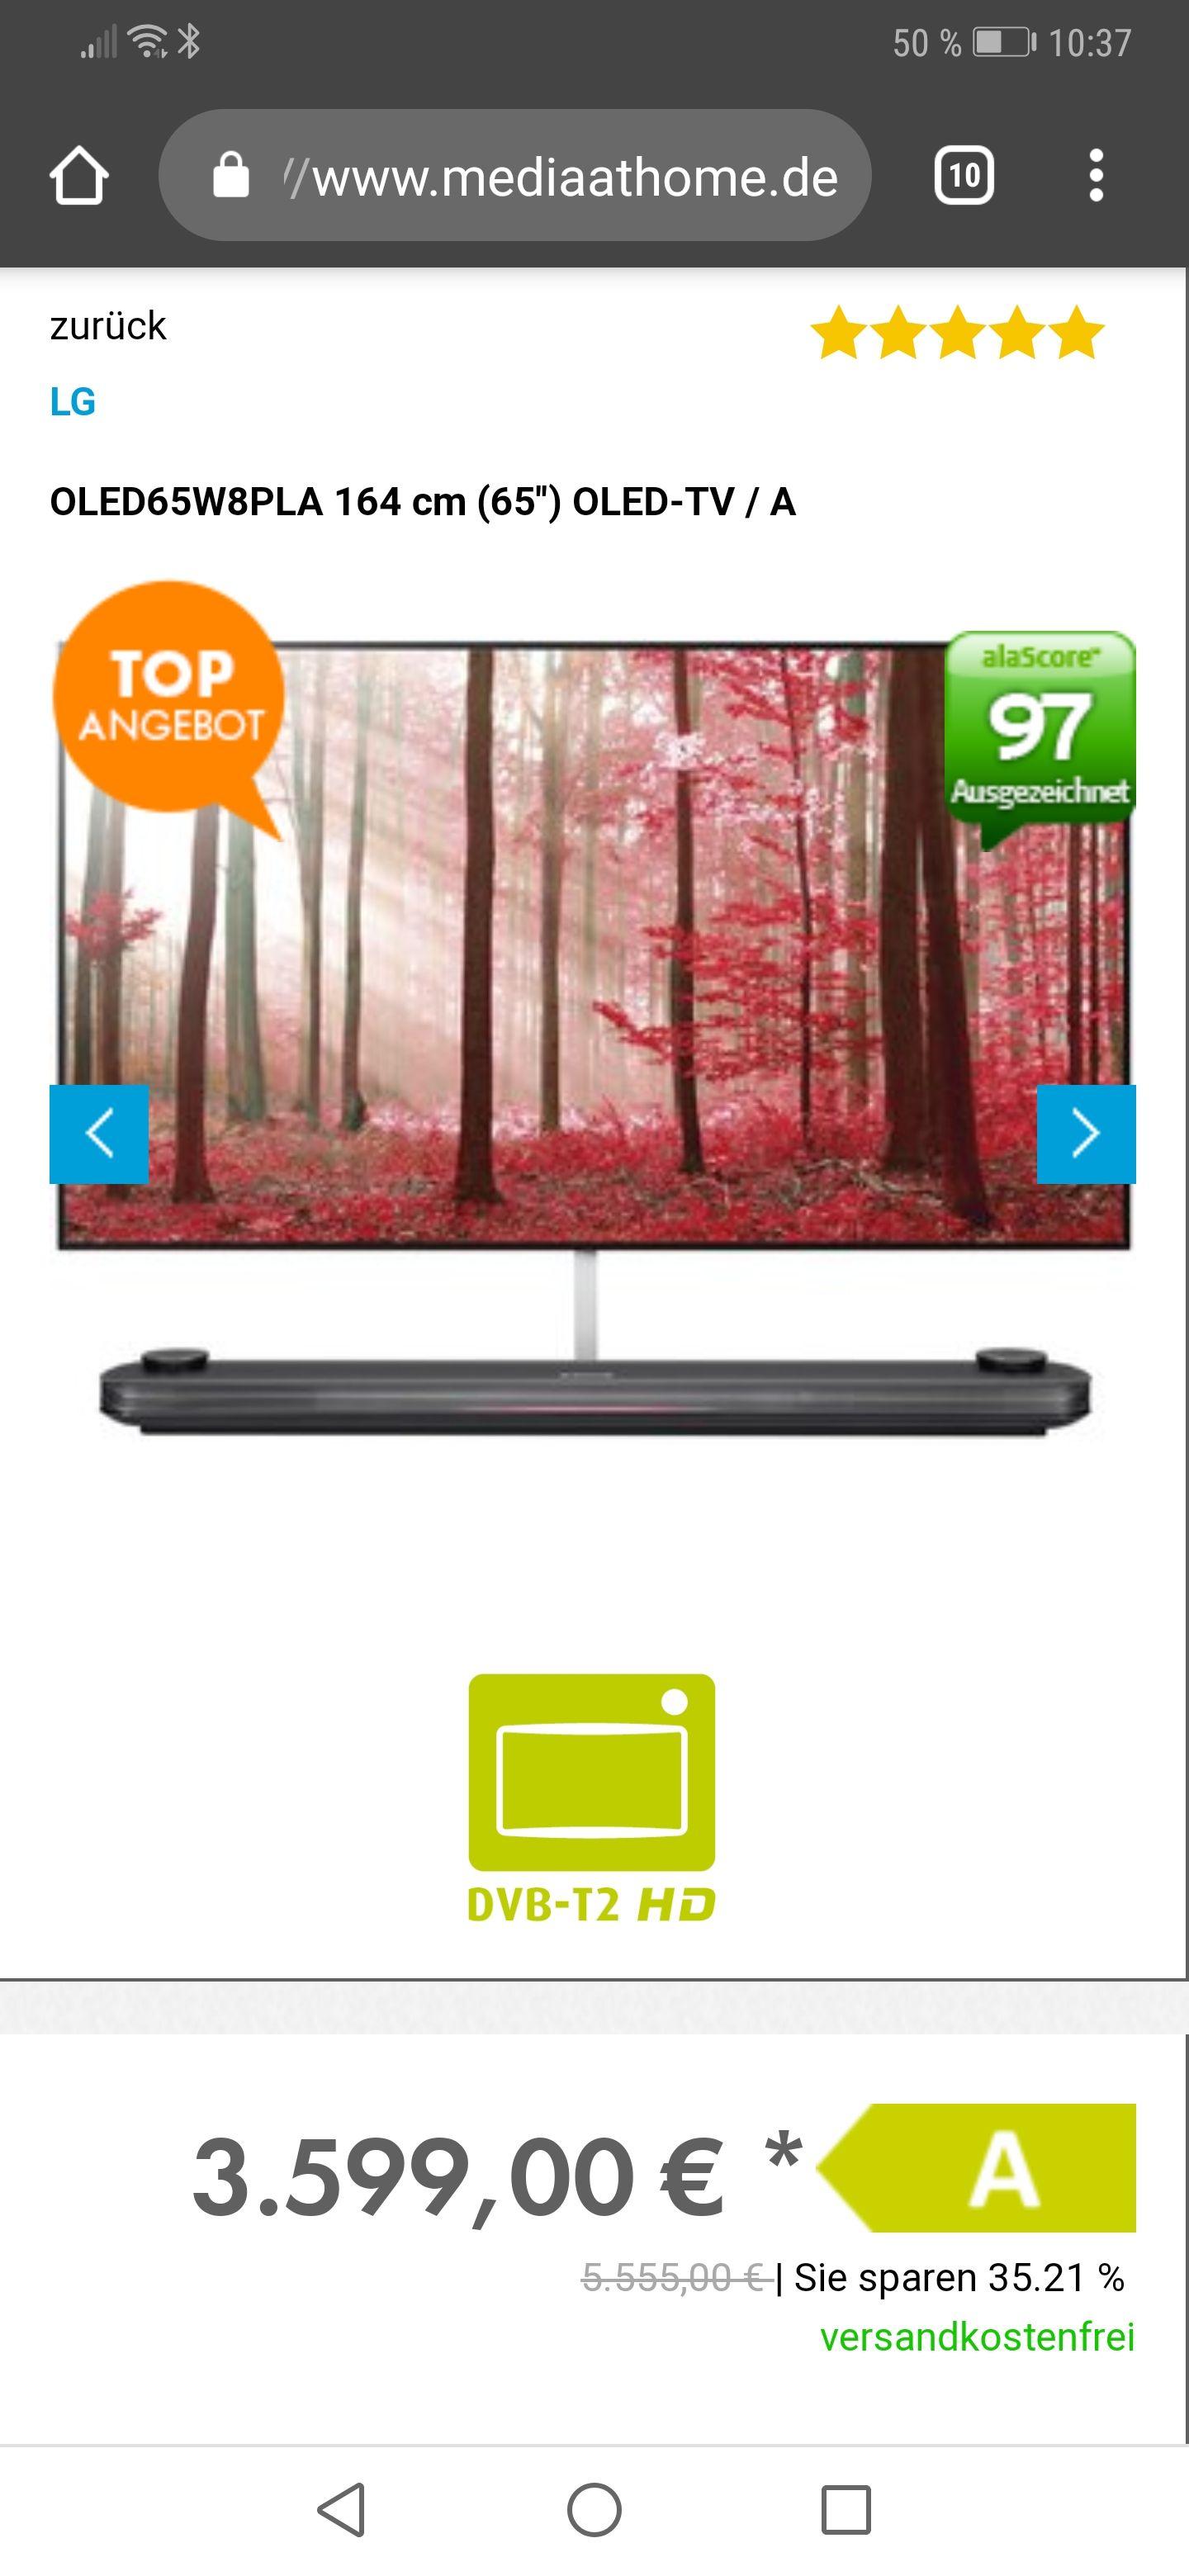 LG SIGNATURE OLED65W8PLA, 164 CM (65 ZOLL), UHD 4K, SMART TV, OLED TV, DVB-T2 HD, DVB-C, DVB-S2